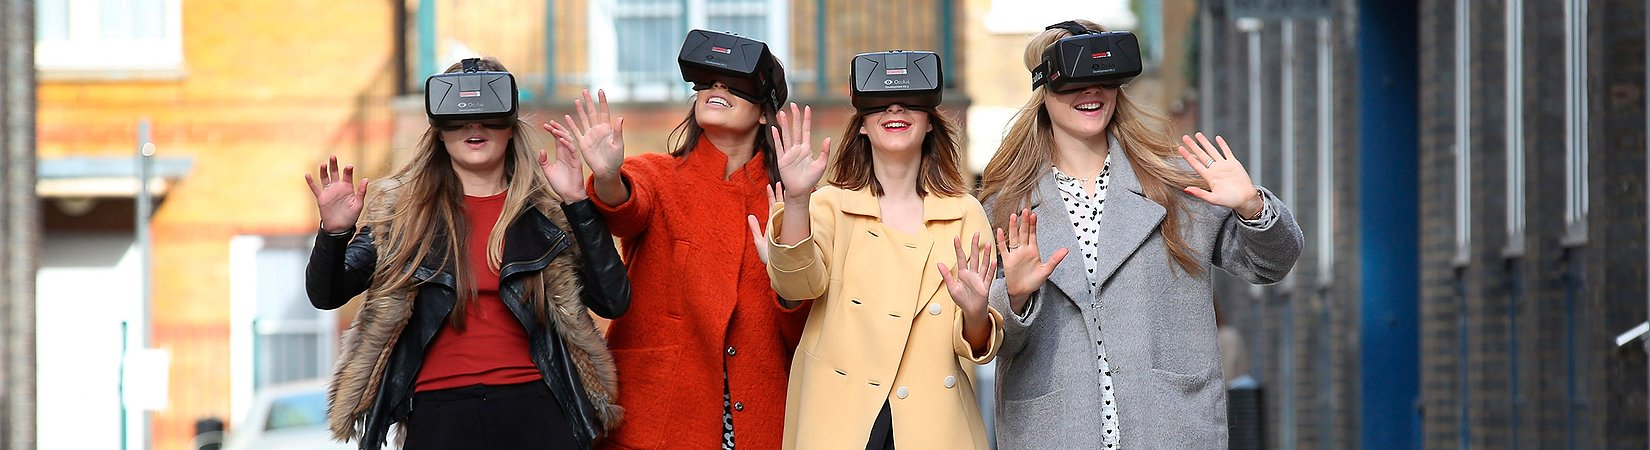 So kann man in Virtual Reality investieren